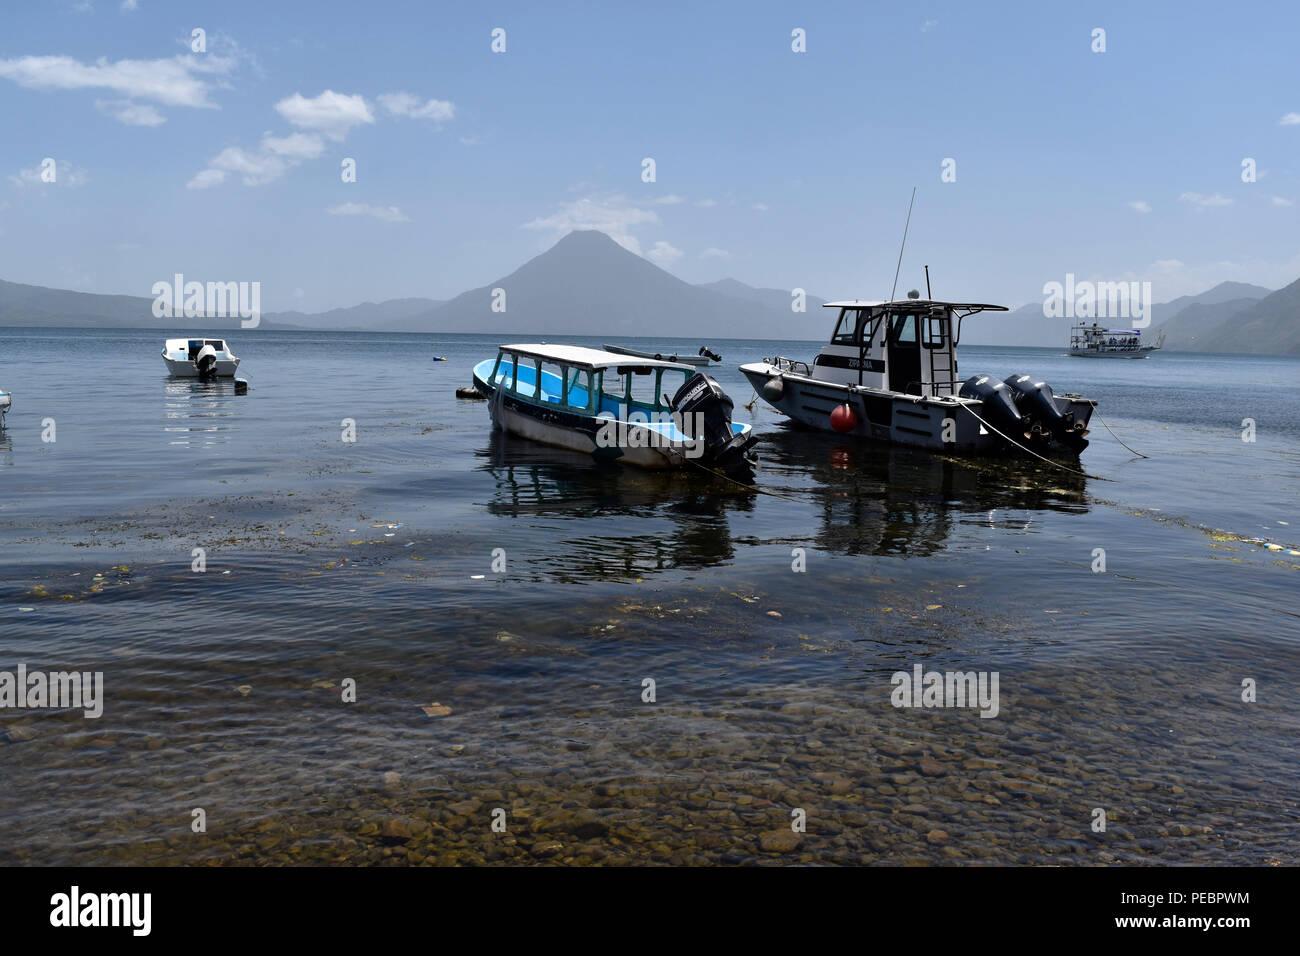 Lake Panajachel in Guatemala in the middle of three volcanoes. 14 July 2018 - Stock Image